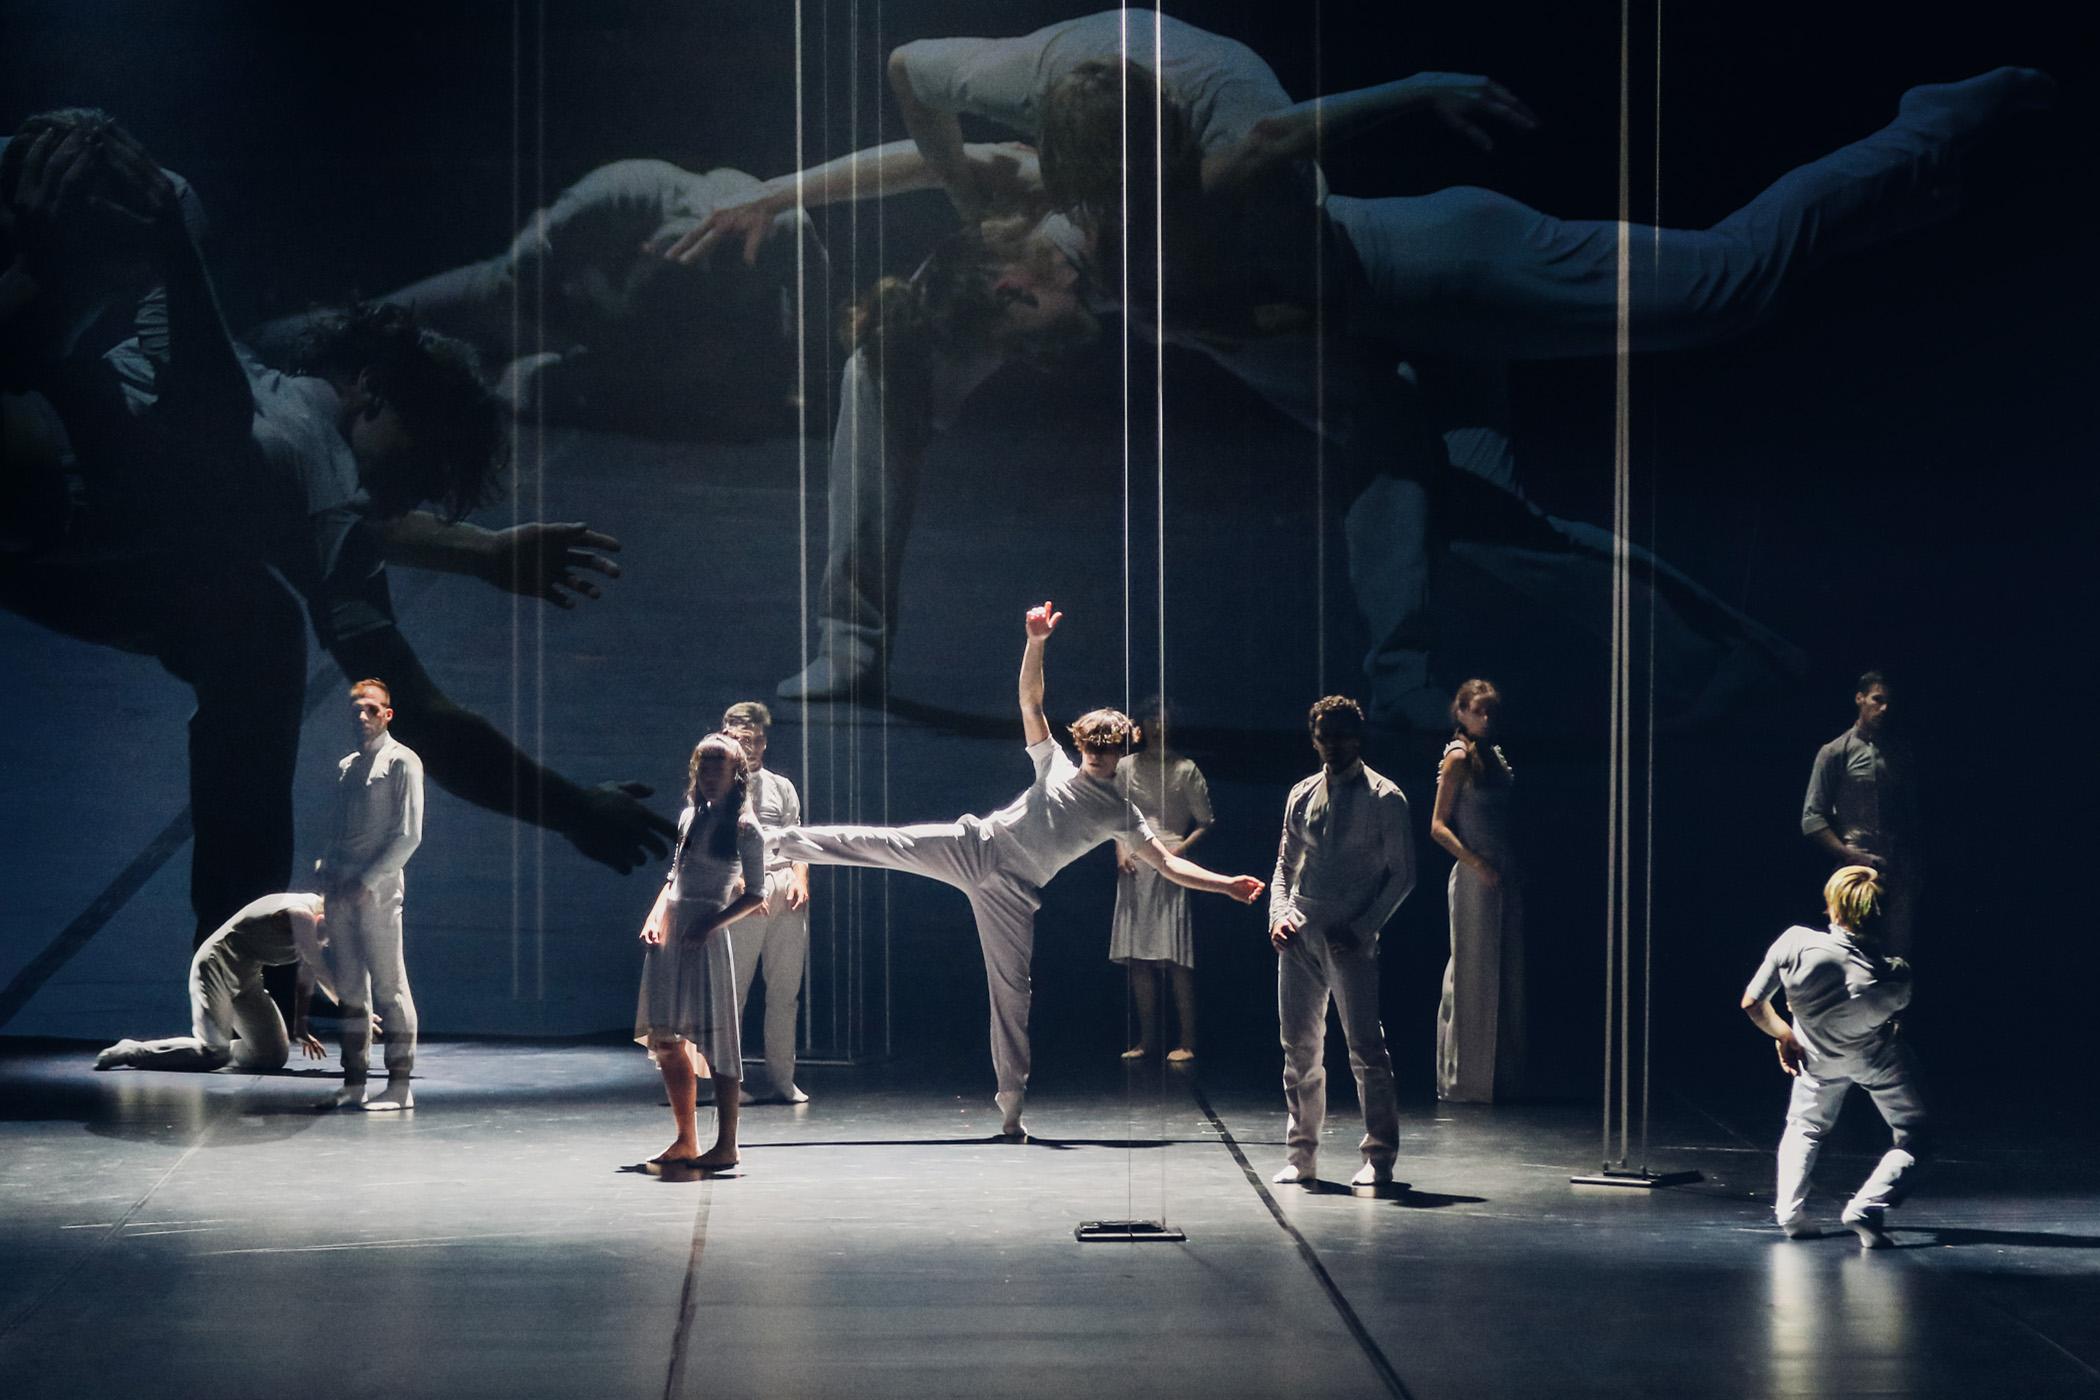 A Puppetry of Dark Ballet at Staatballett Berlin